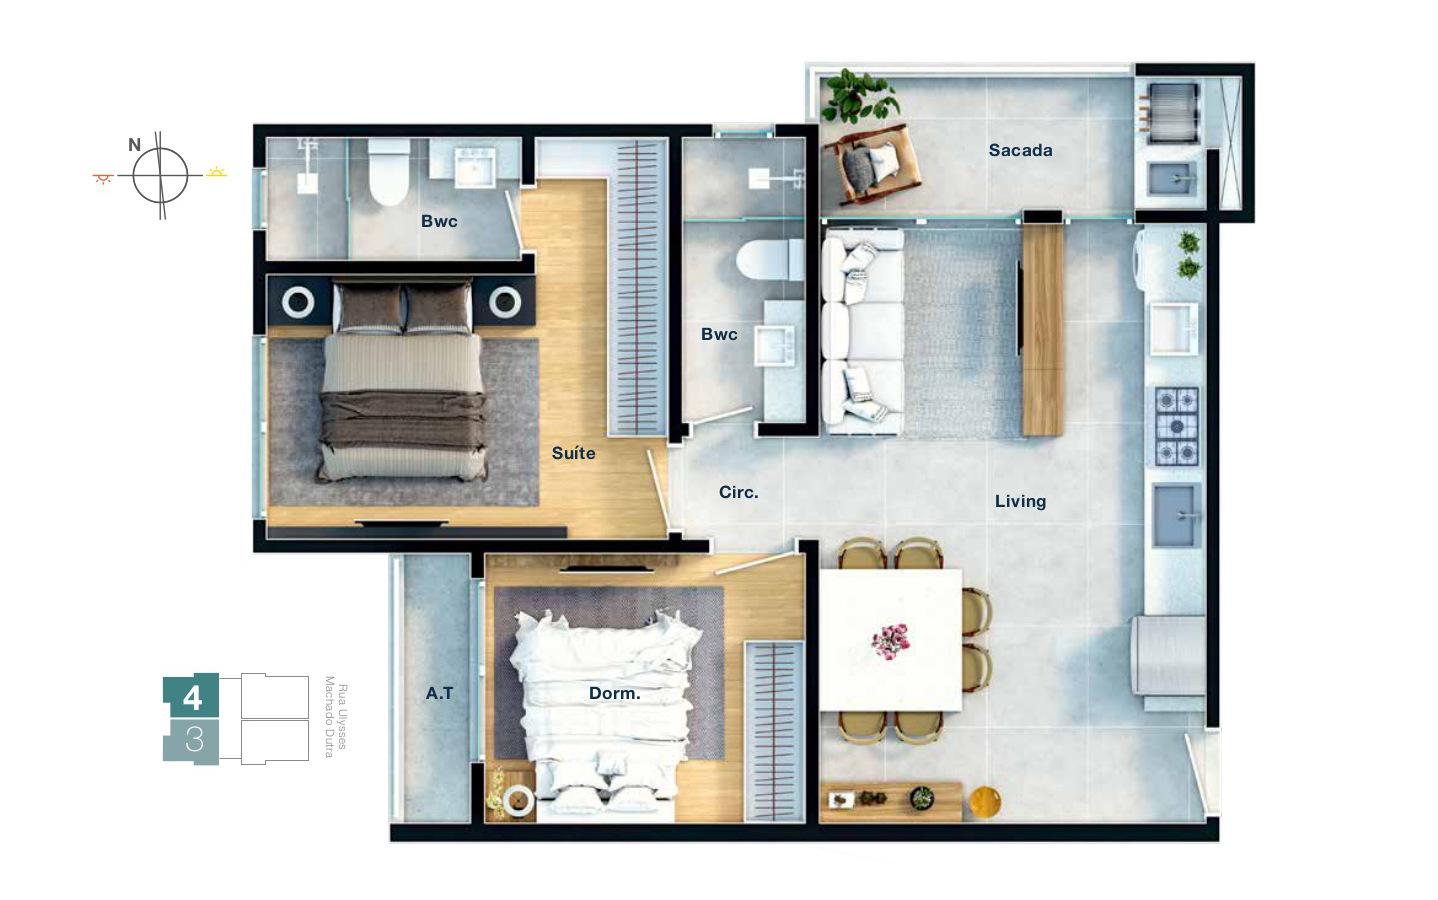 Planta do apartamento - TIPO 3 E 4